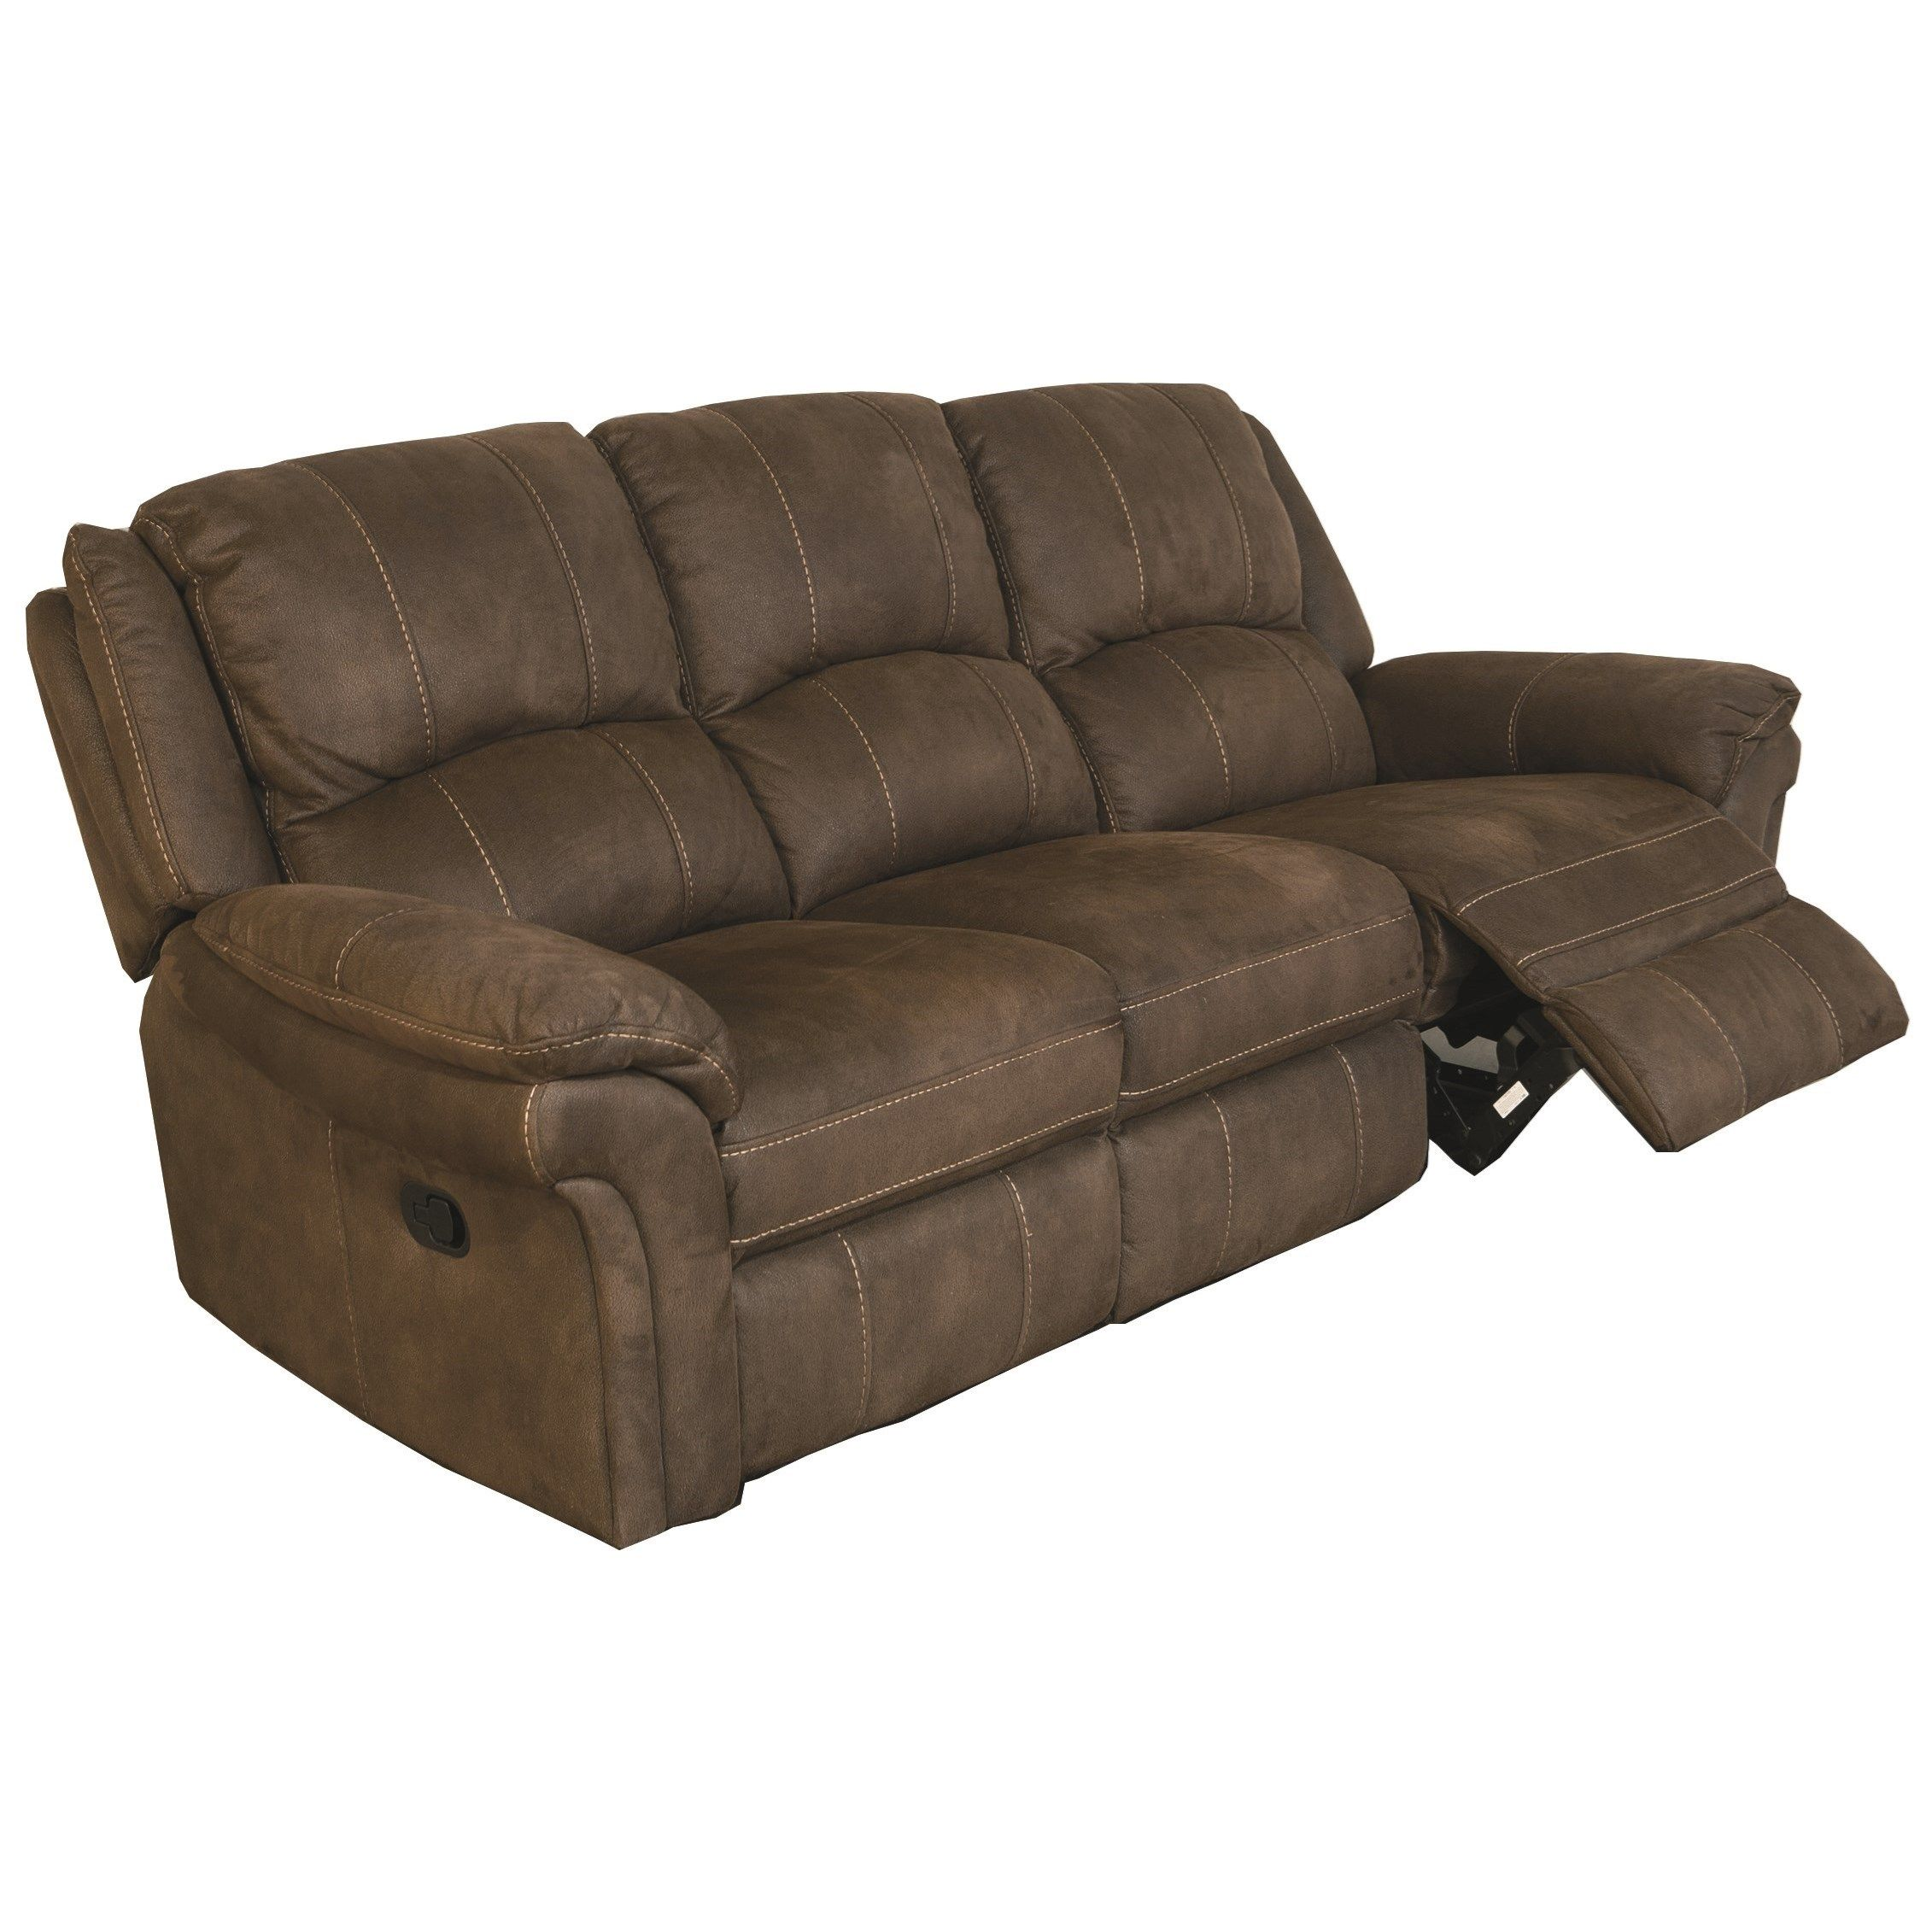 Boman Dual Reclining Sofa By Cheers Sofa At John V Schultz Furniture